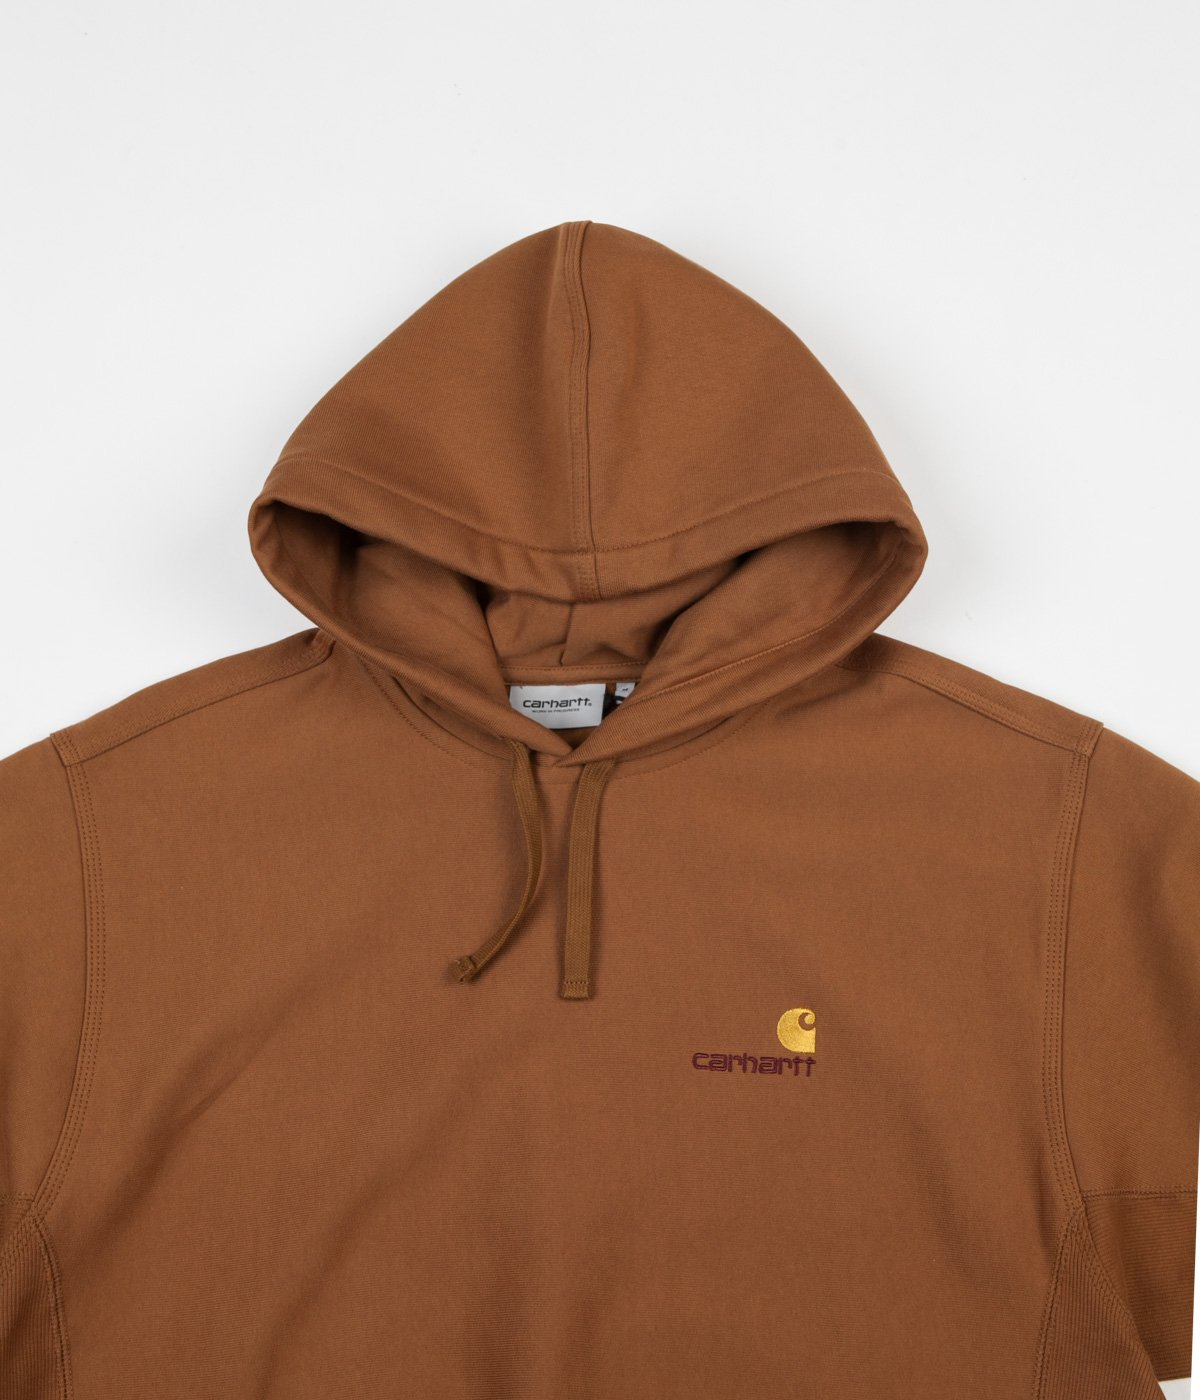 carhartt american script hoodie hamilton brown 4 2